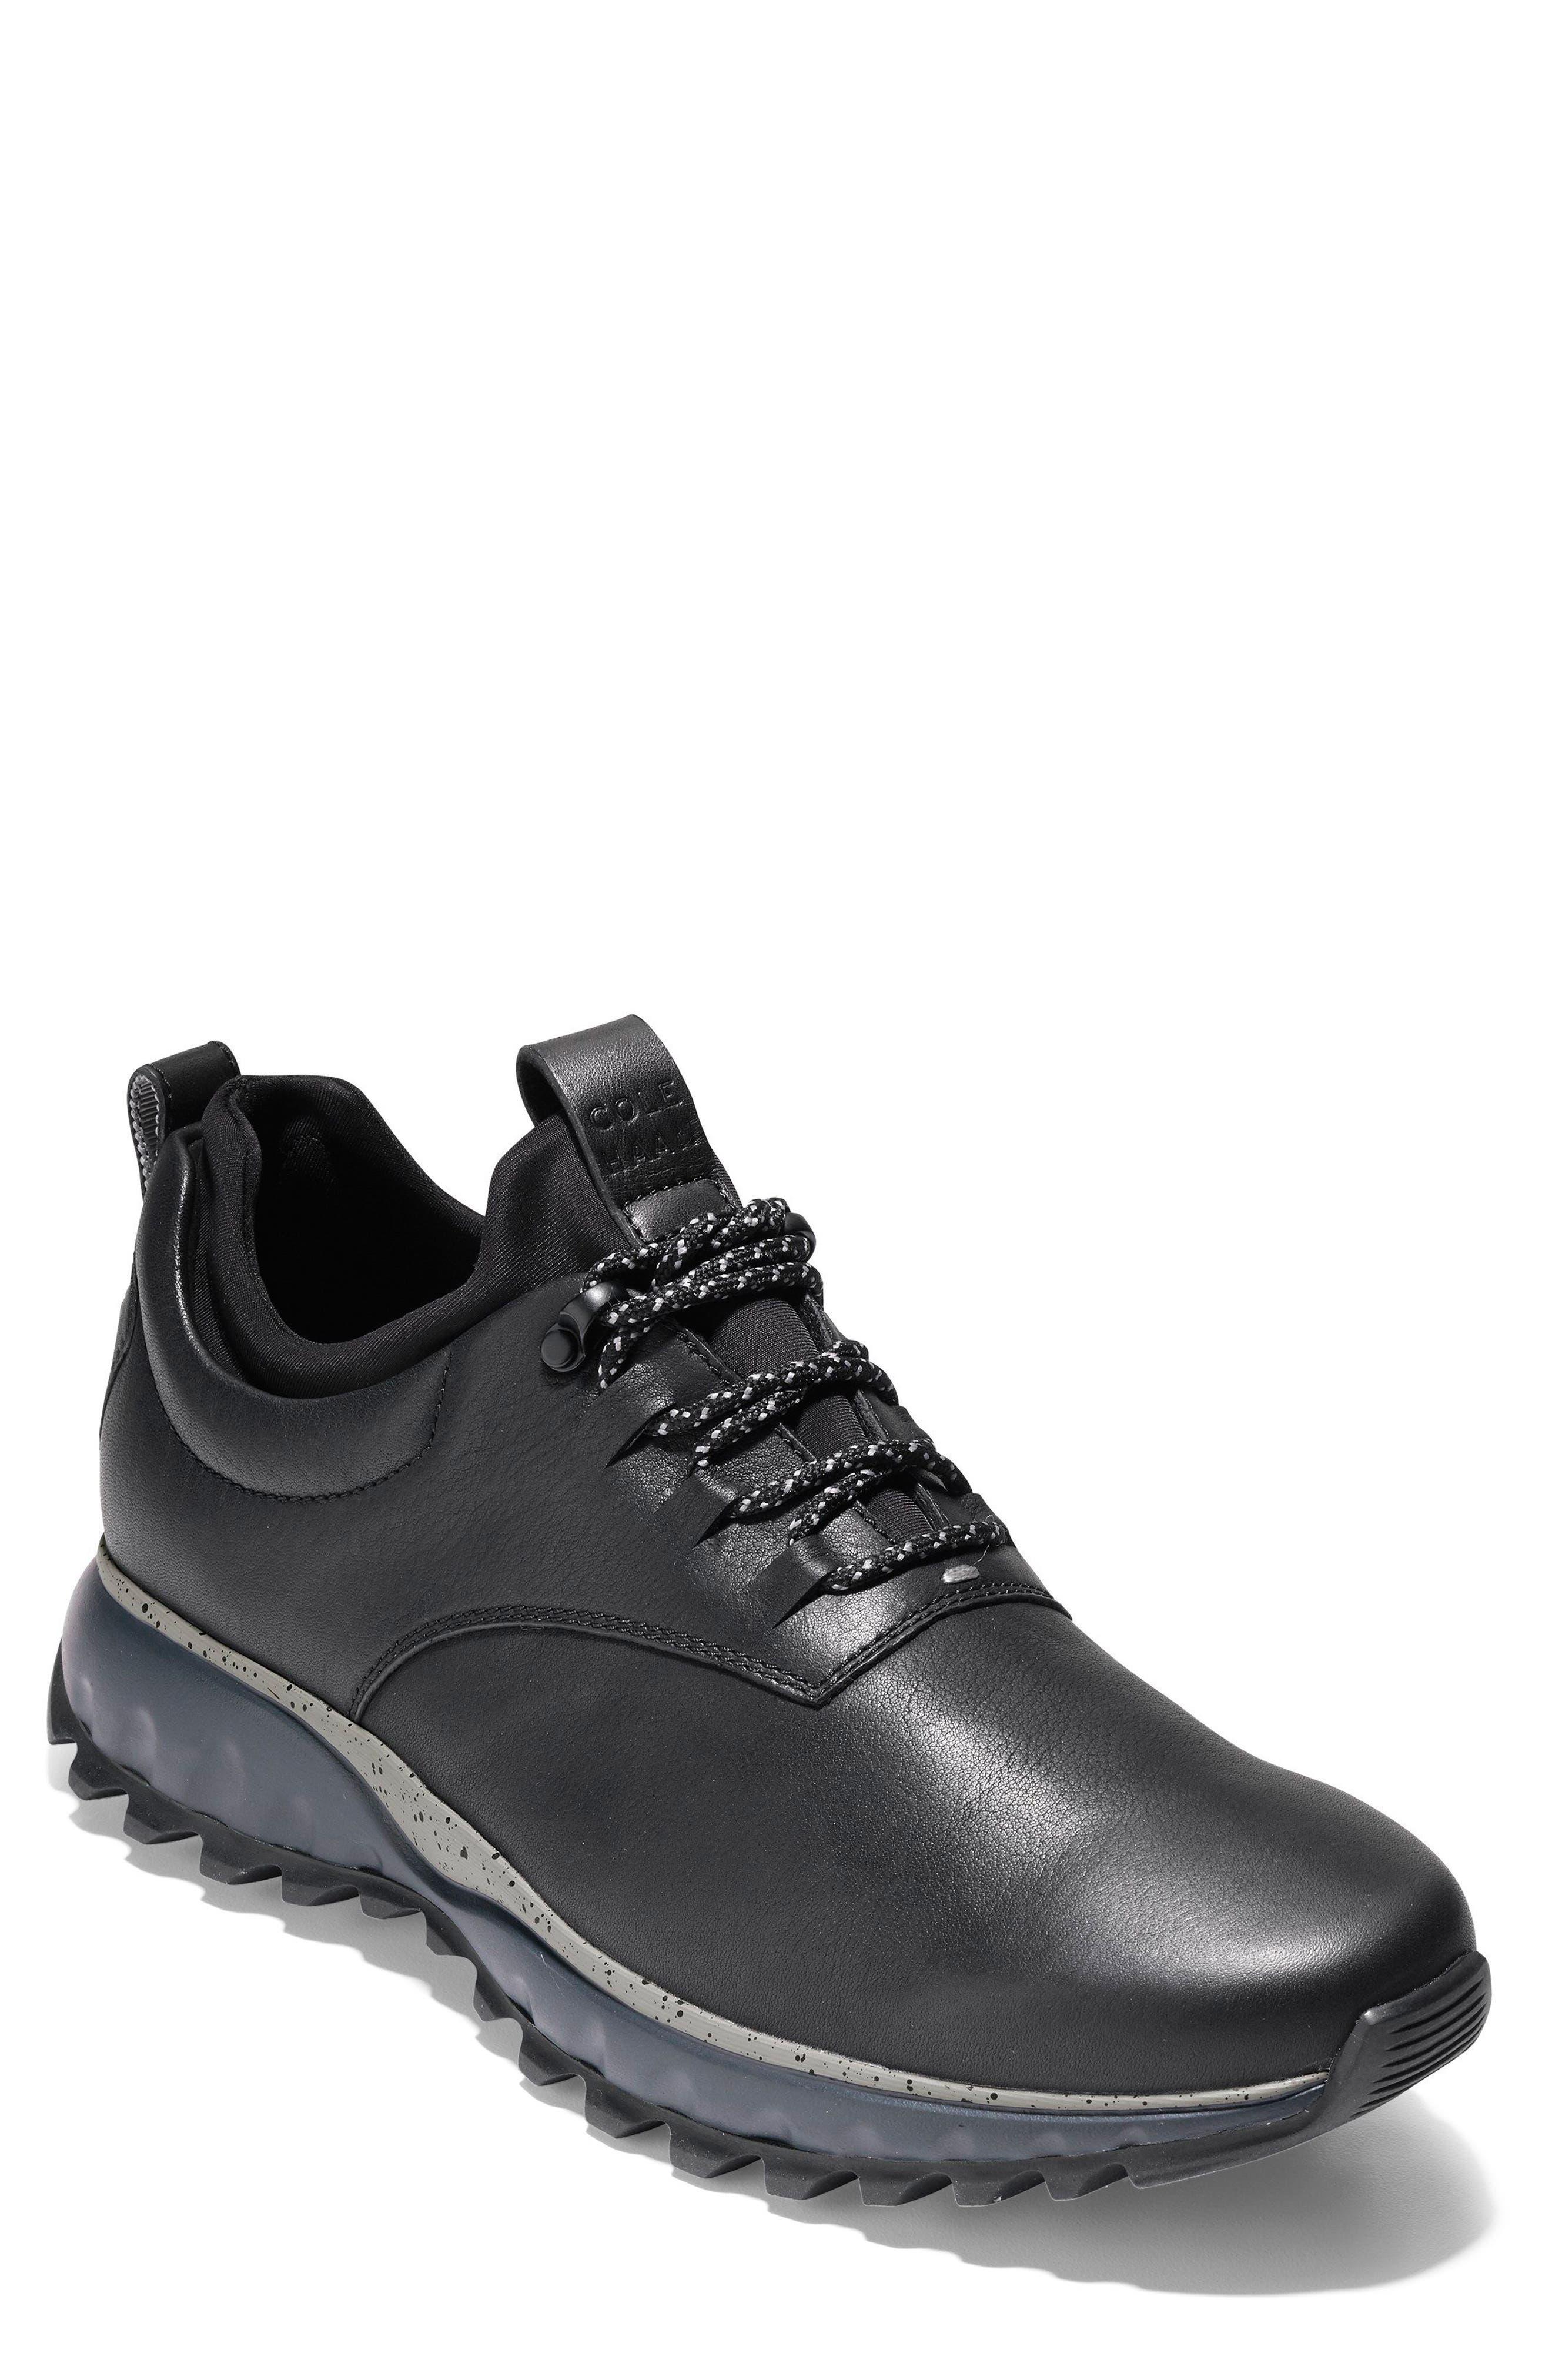 GrandExpløre All Terrain Waterproof Sneaker,                             Main thumbnail 1, color,                             Black/ Ironstone Leather